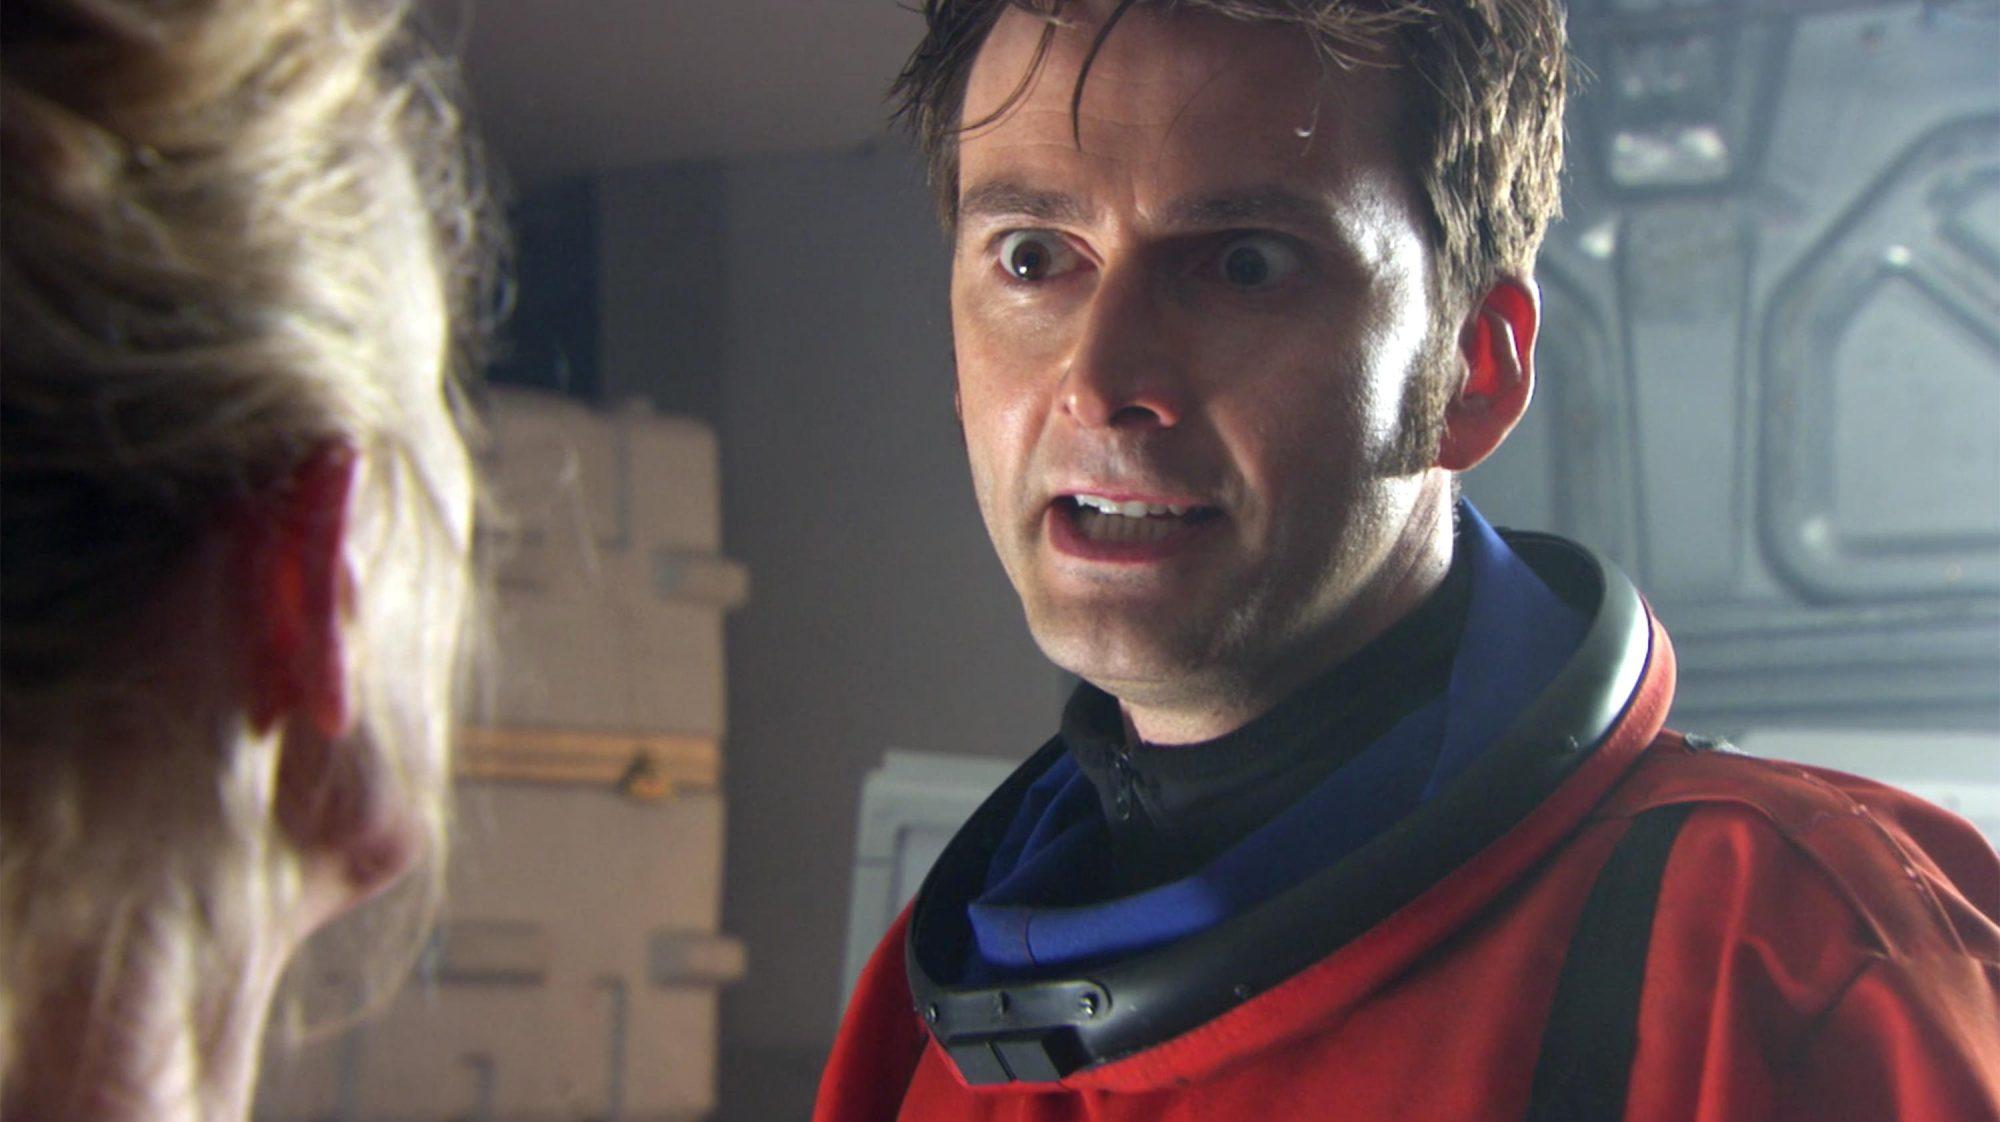 Doctor Who screen grab Credit: BBC AMERICA